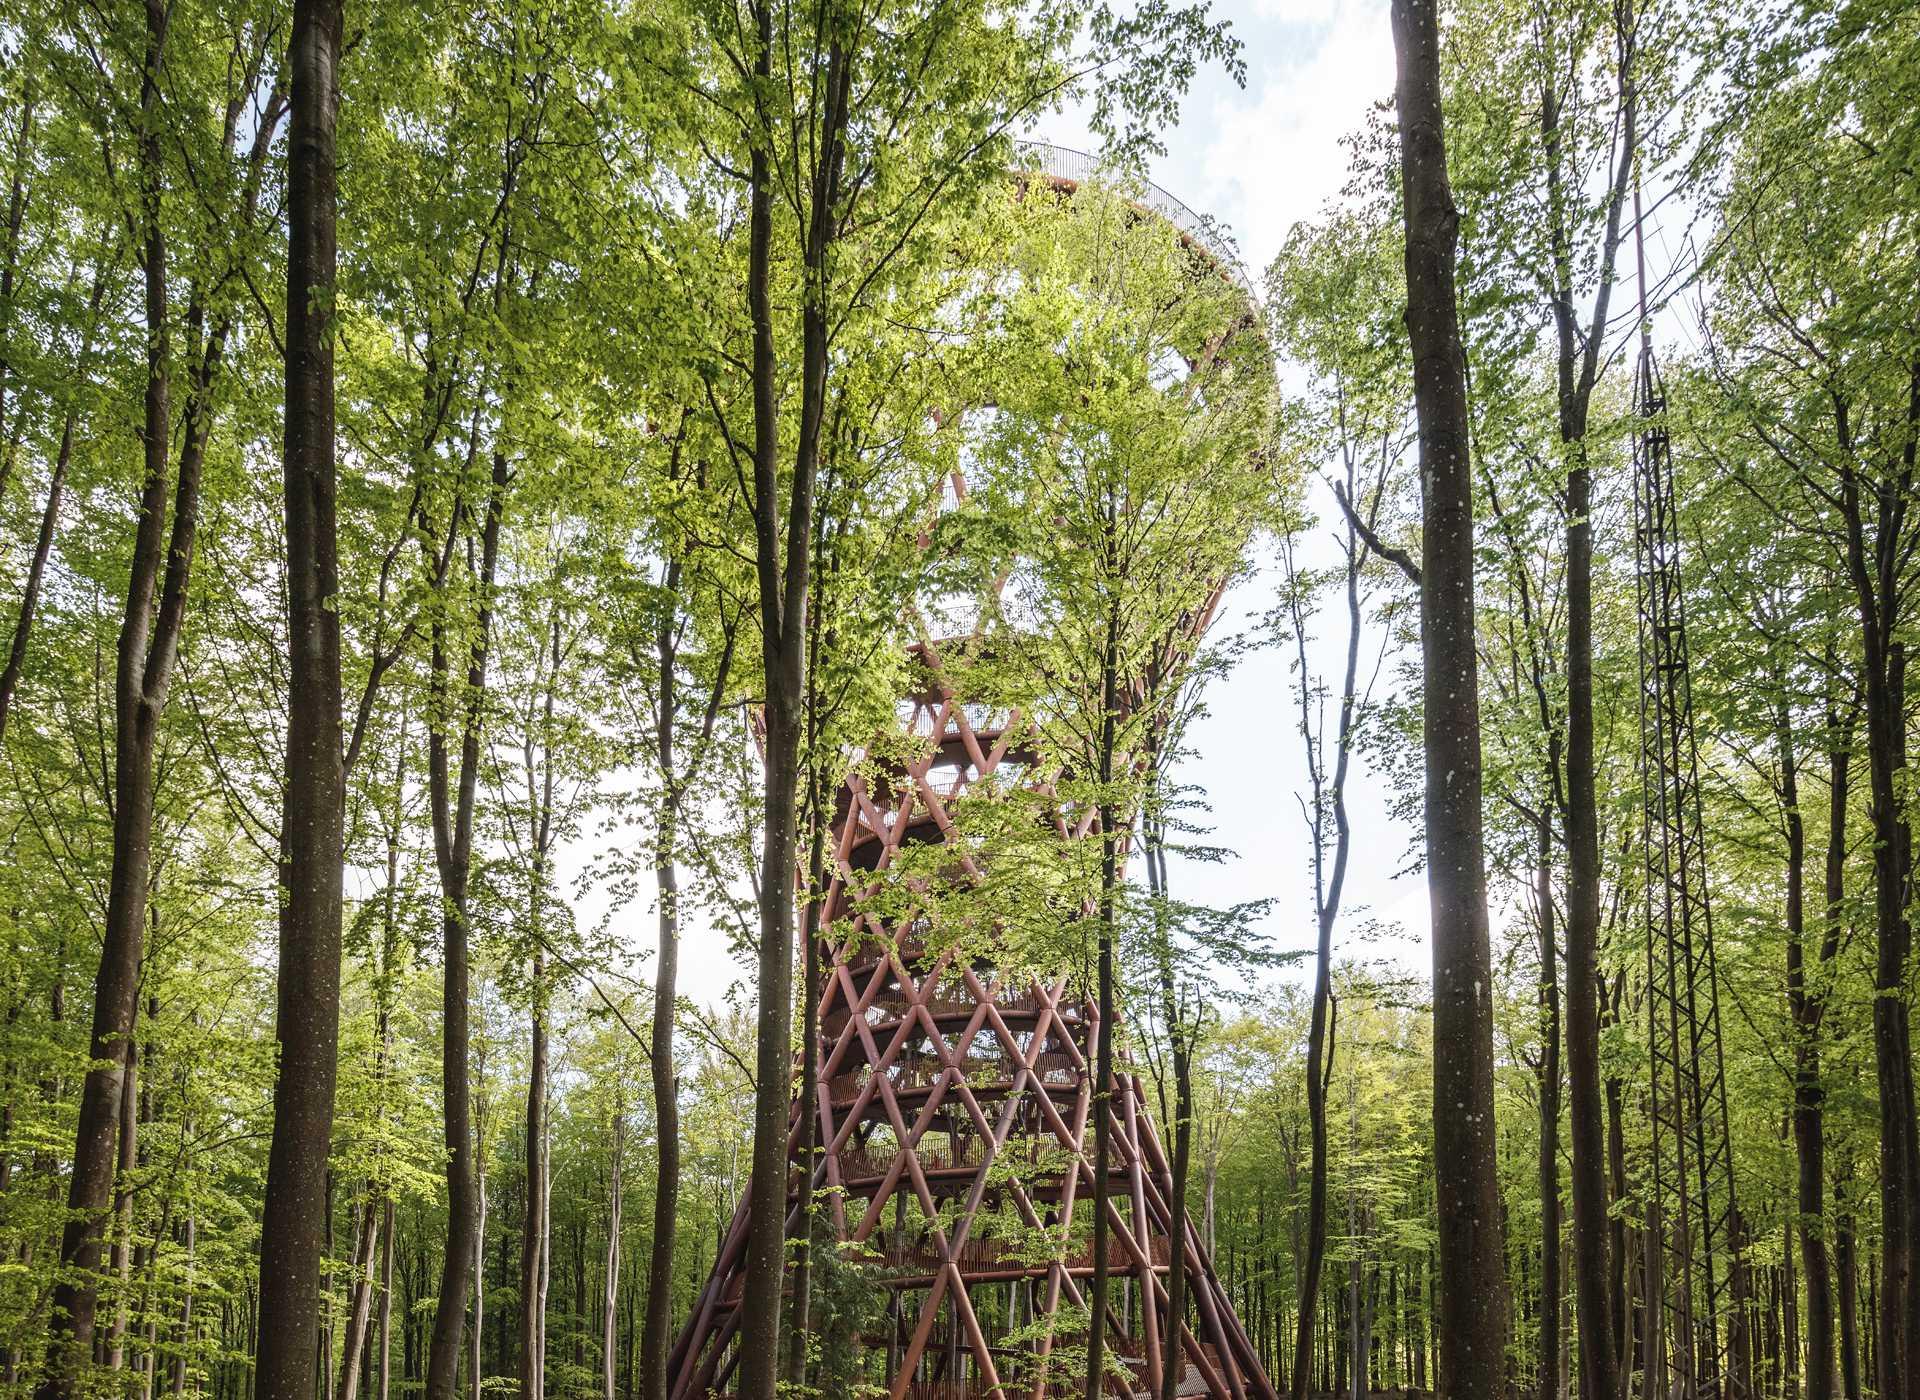 Camp Adventure Park  - 39 5 41